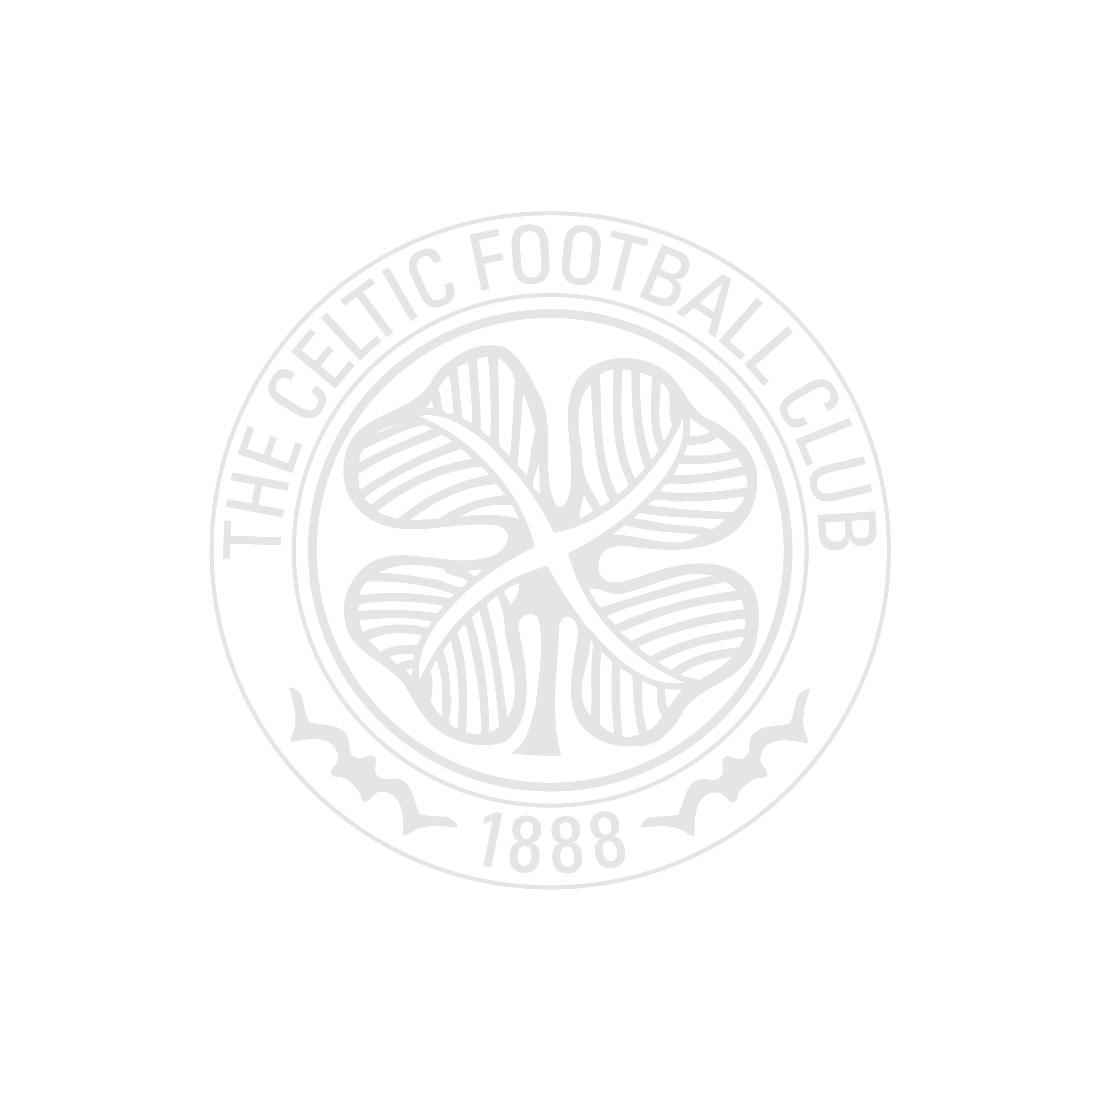 Celtic Mens Away Shirt 19/20 with Sponsor